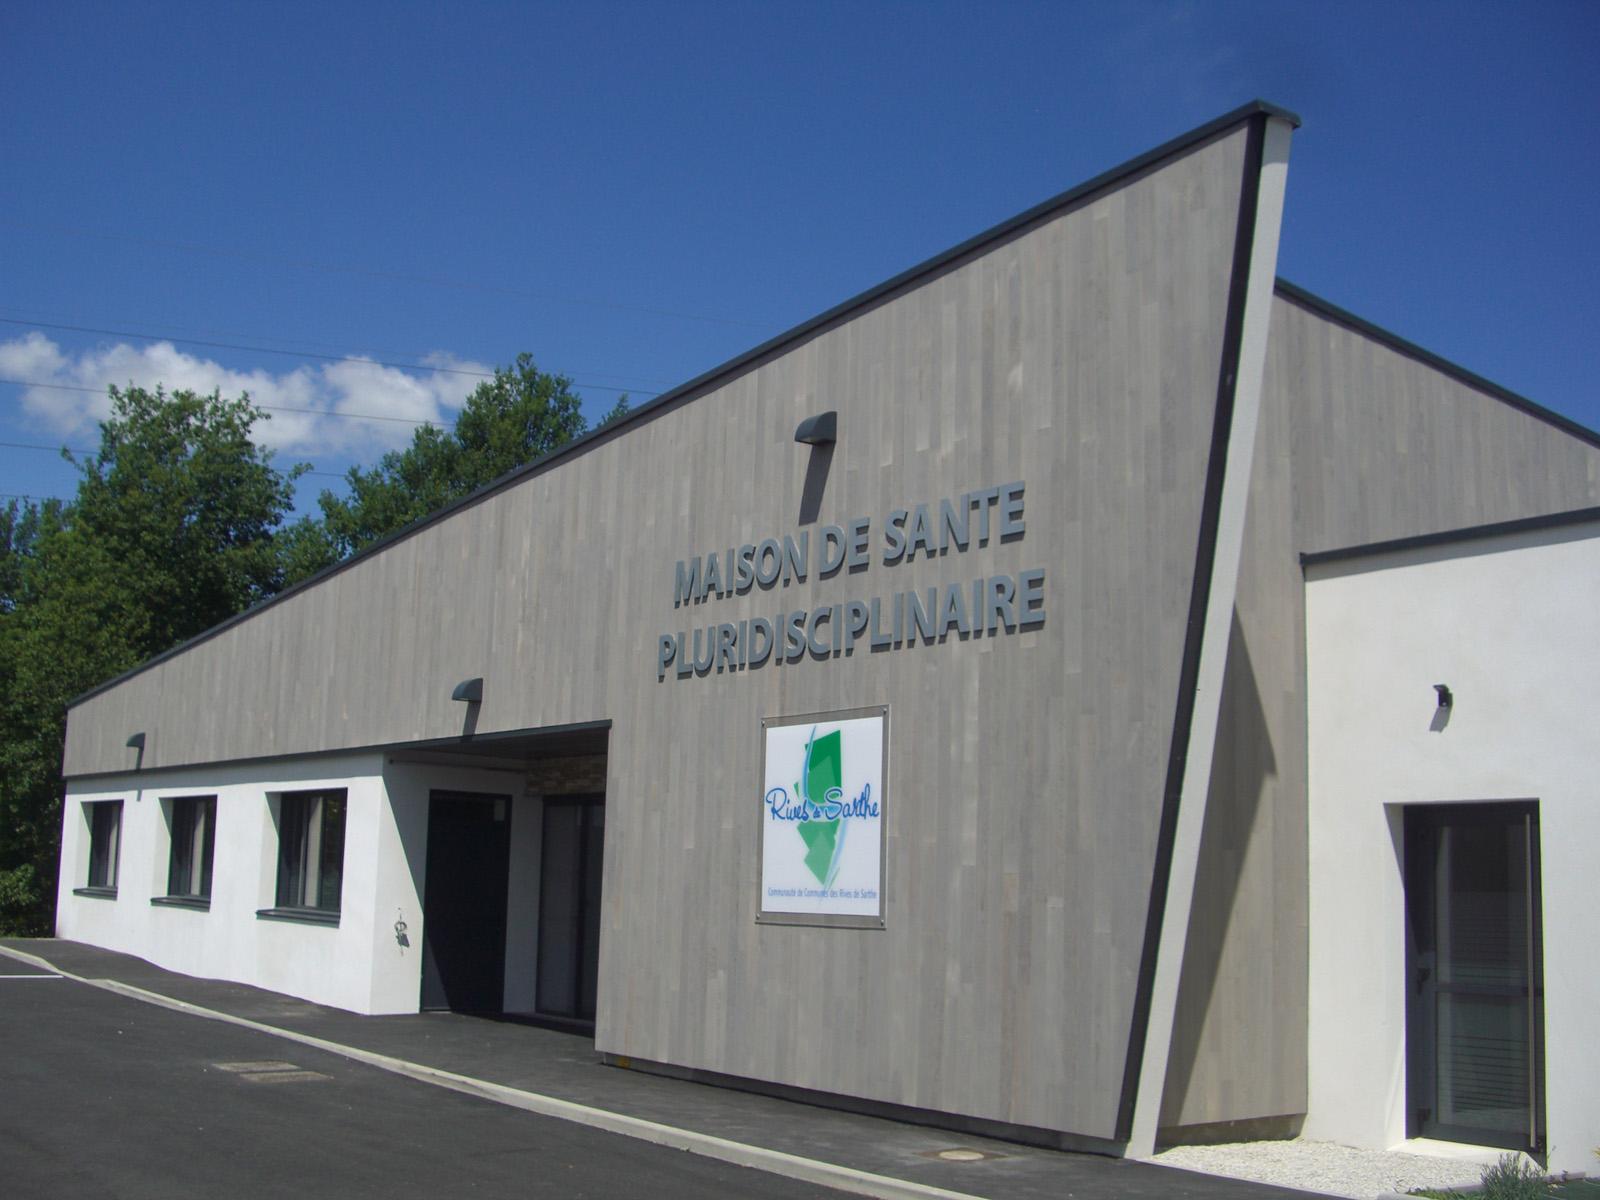 cabinet-medical-sainte-jamme-sur-sarthe